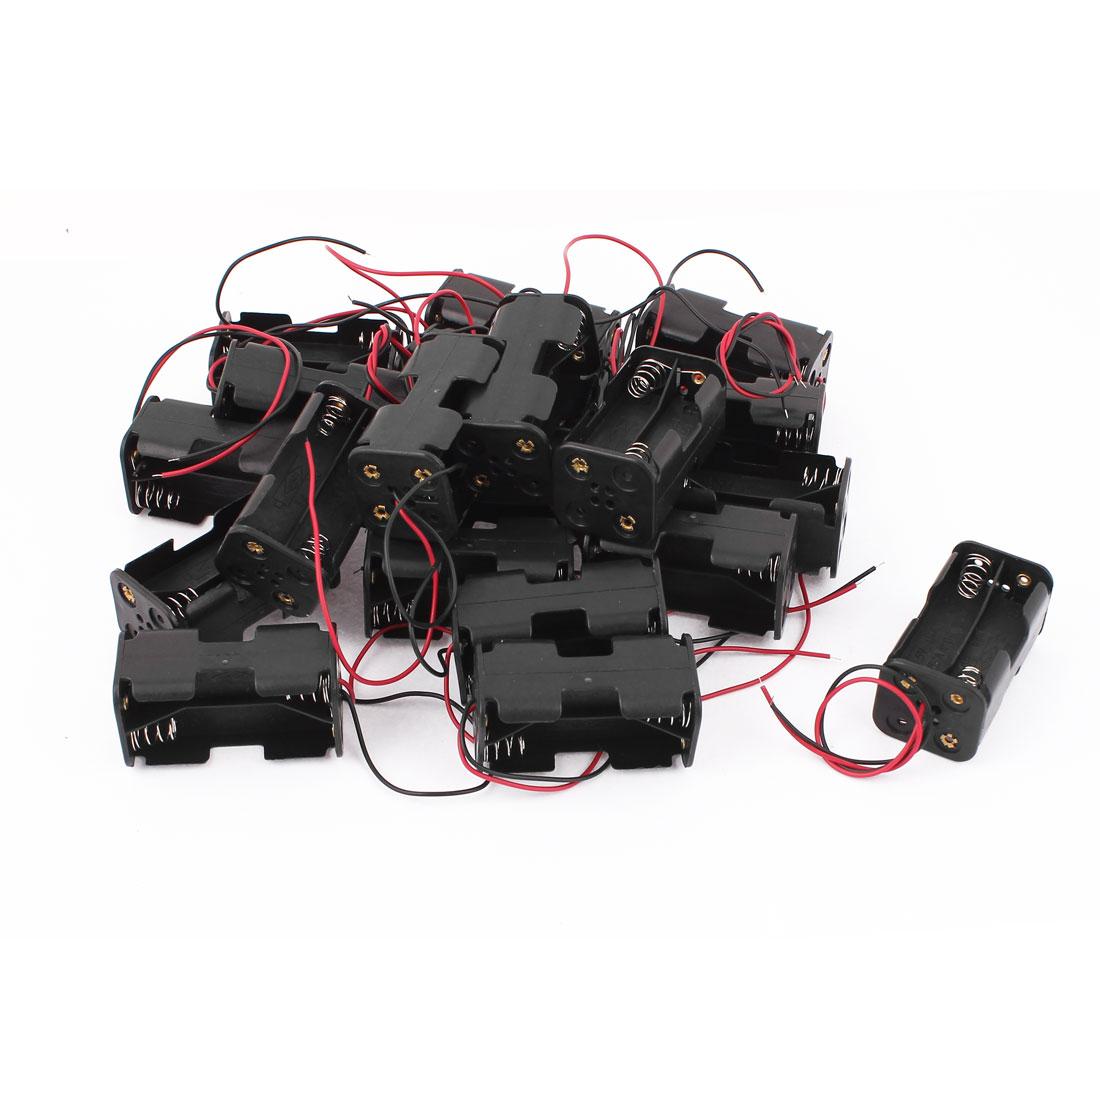 20Pcs Double Side Plastic Battery Holder Box for 4 x 1.5V AA Batteries